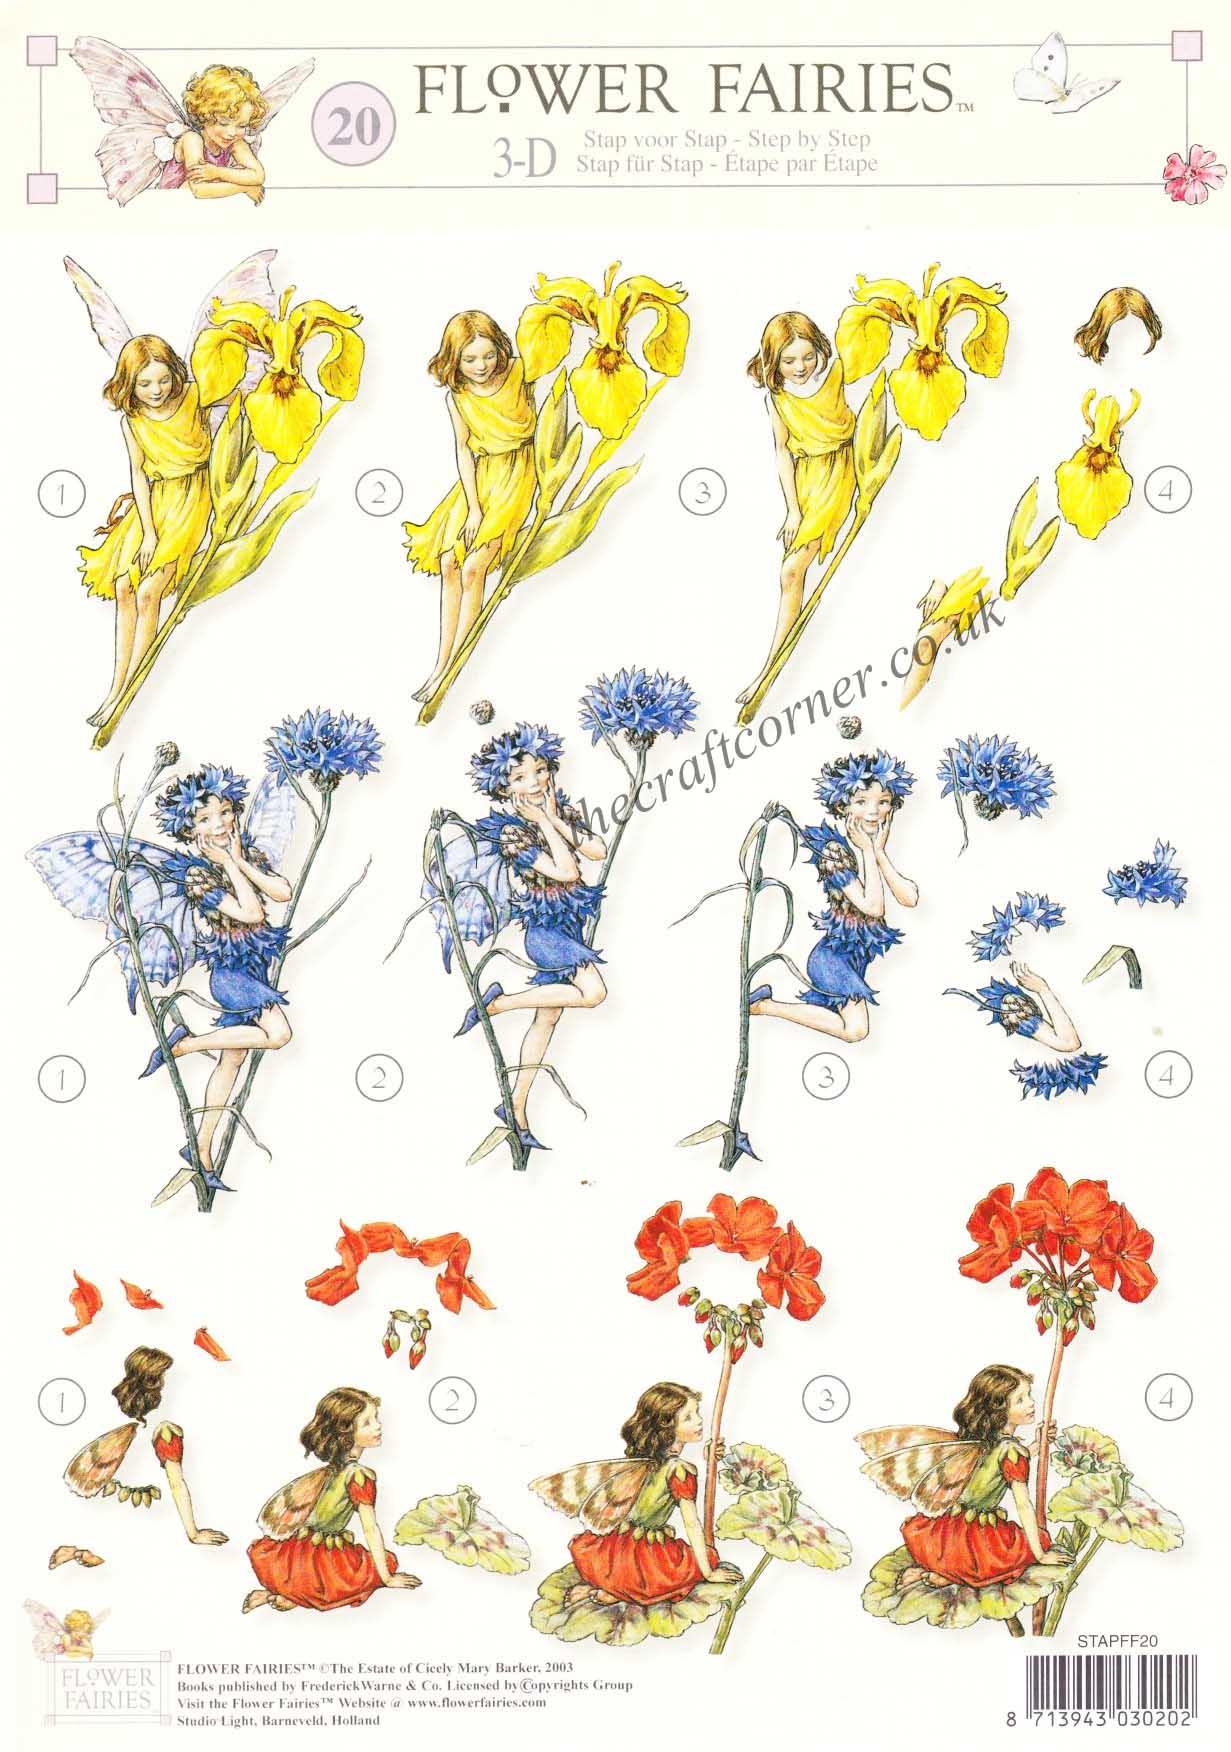 Flower Fairy 20 Geranium Iris and Cornflower Fairies by Cicely.